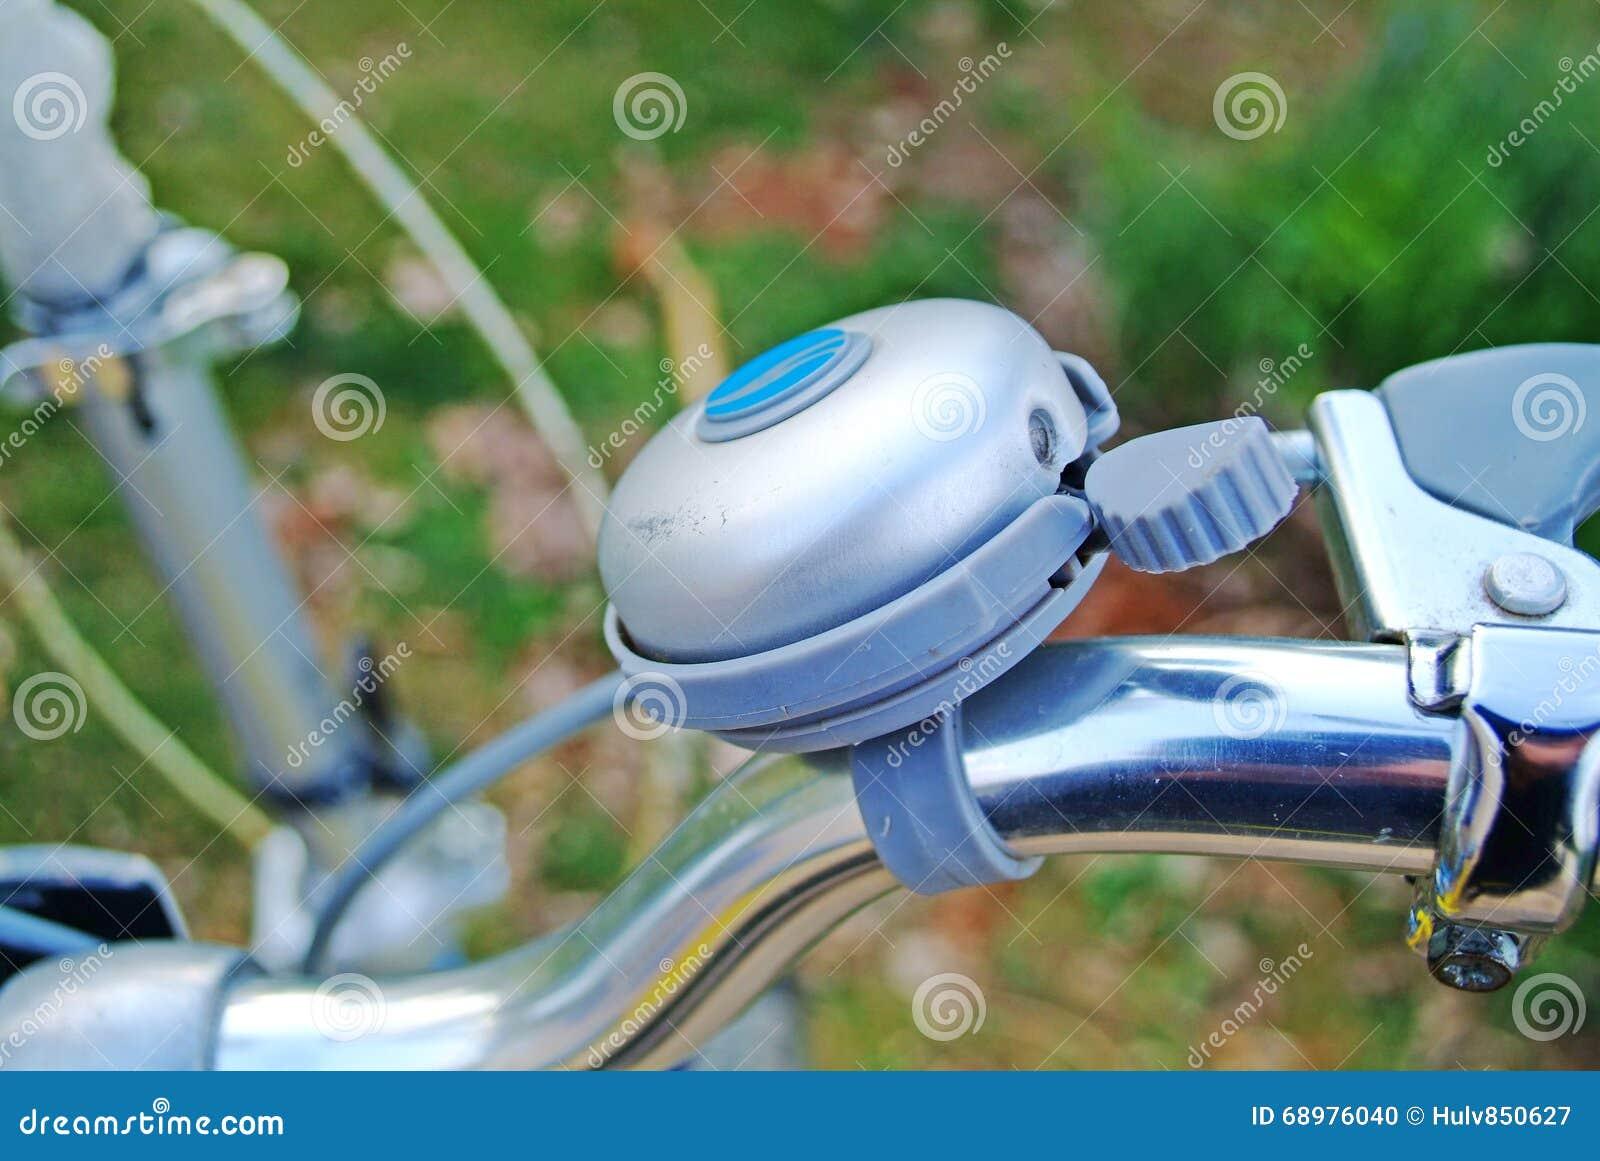 Alarma de la bicicleta